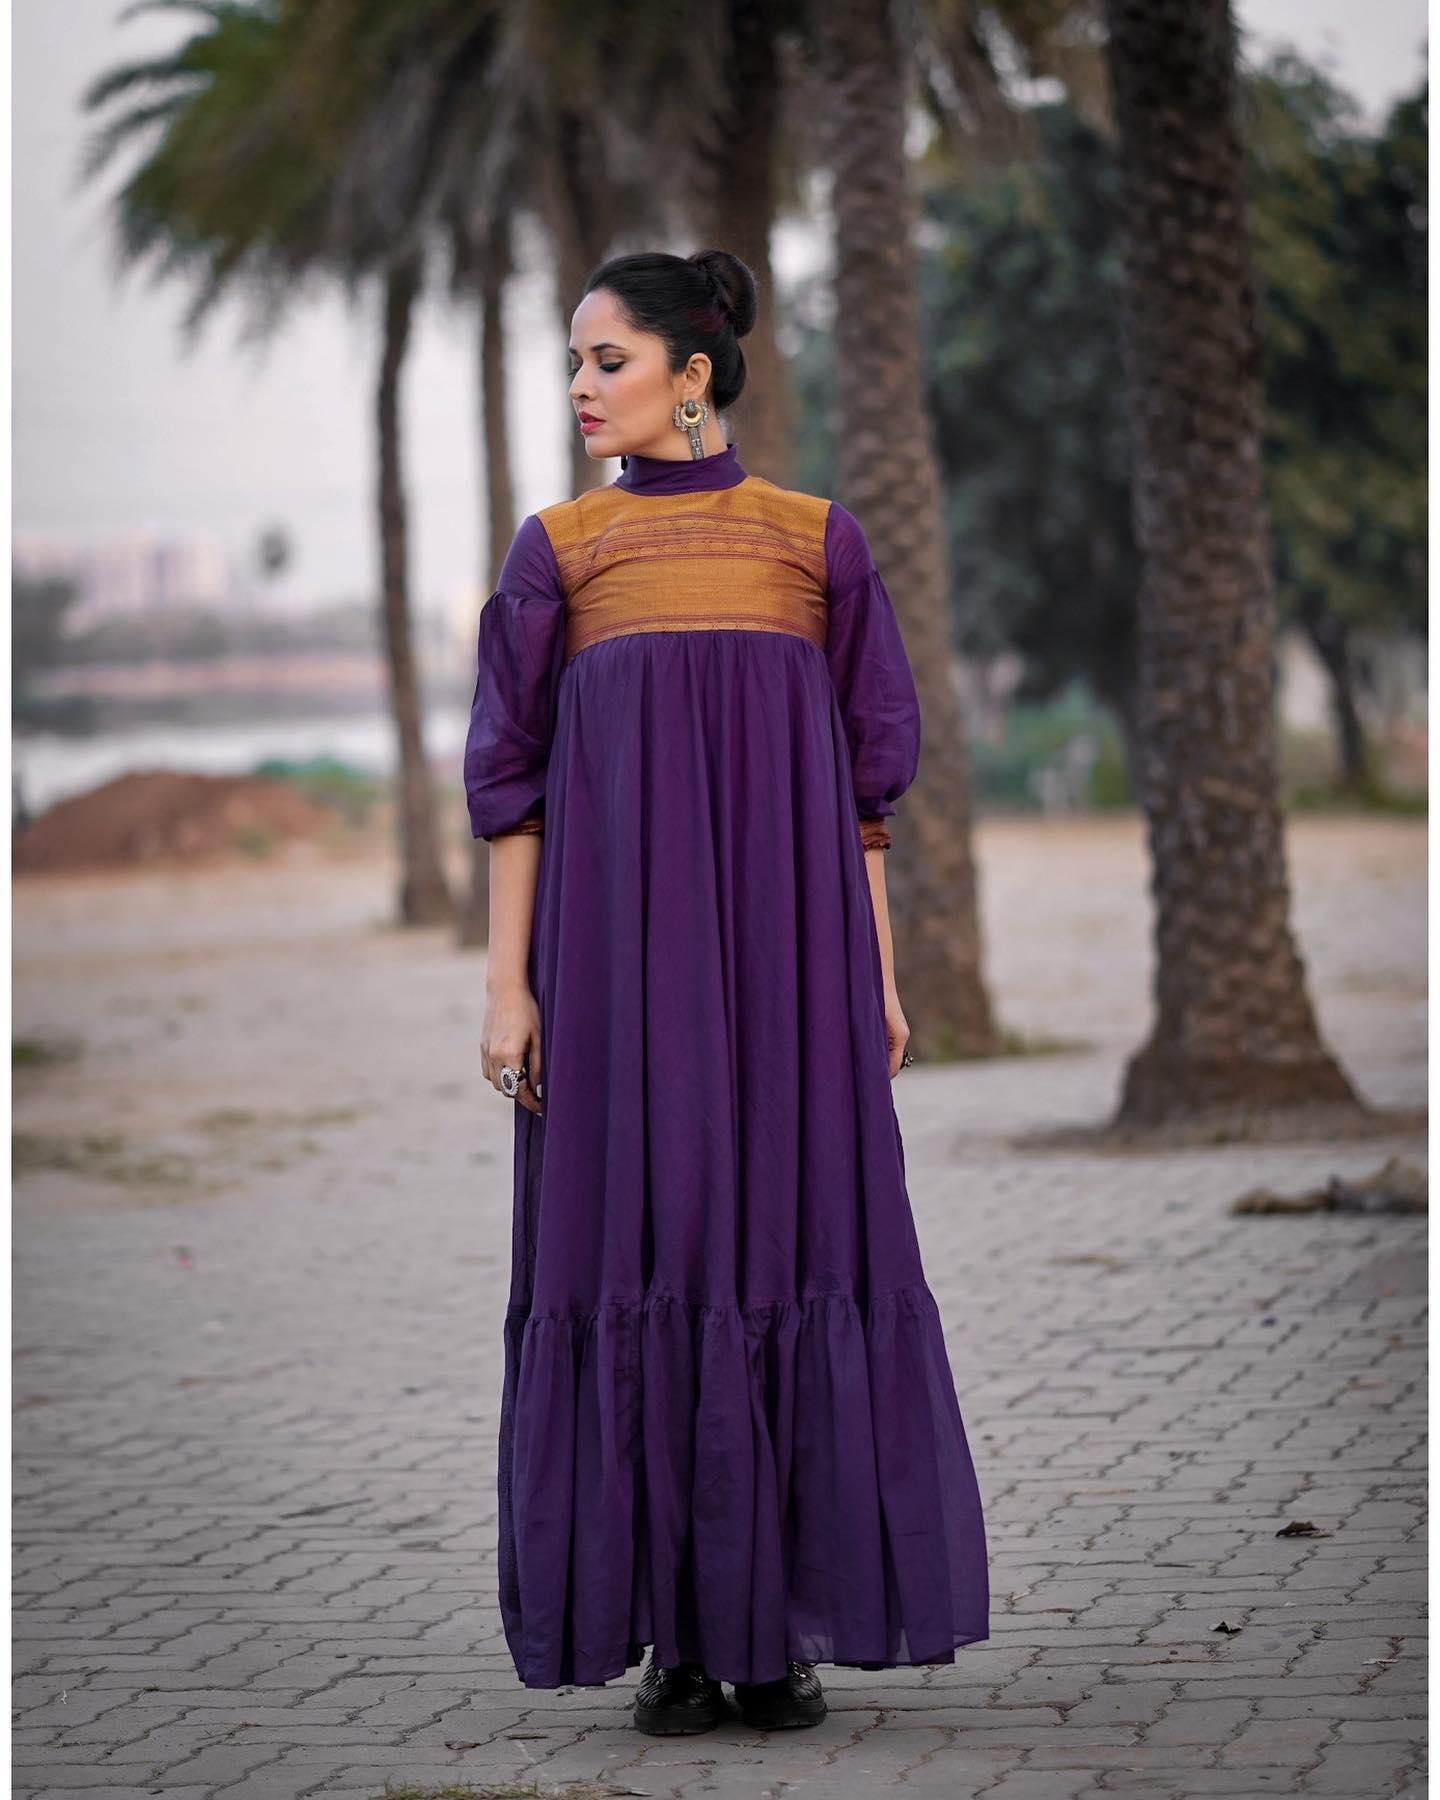 Don't worry Be Purple! Beautiful anchor Anasuya Bardwaj in purple dress    For Jabardast tonyt . 2021-02-26